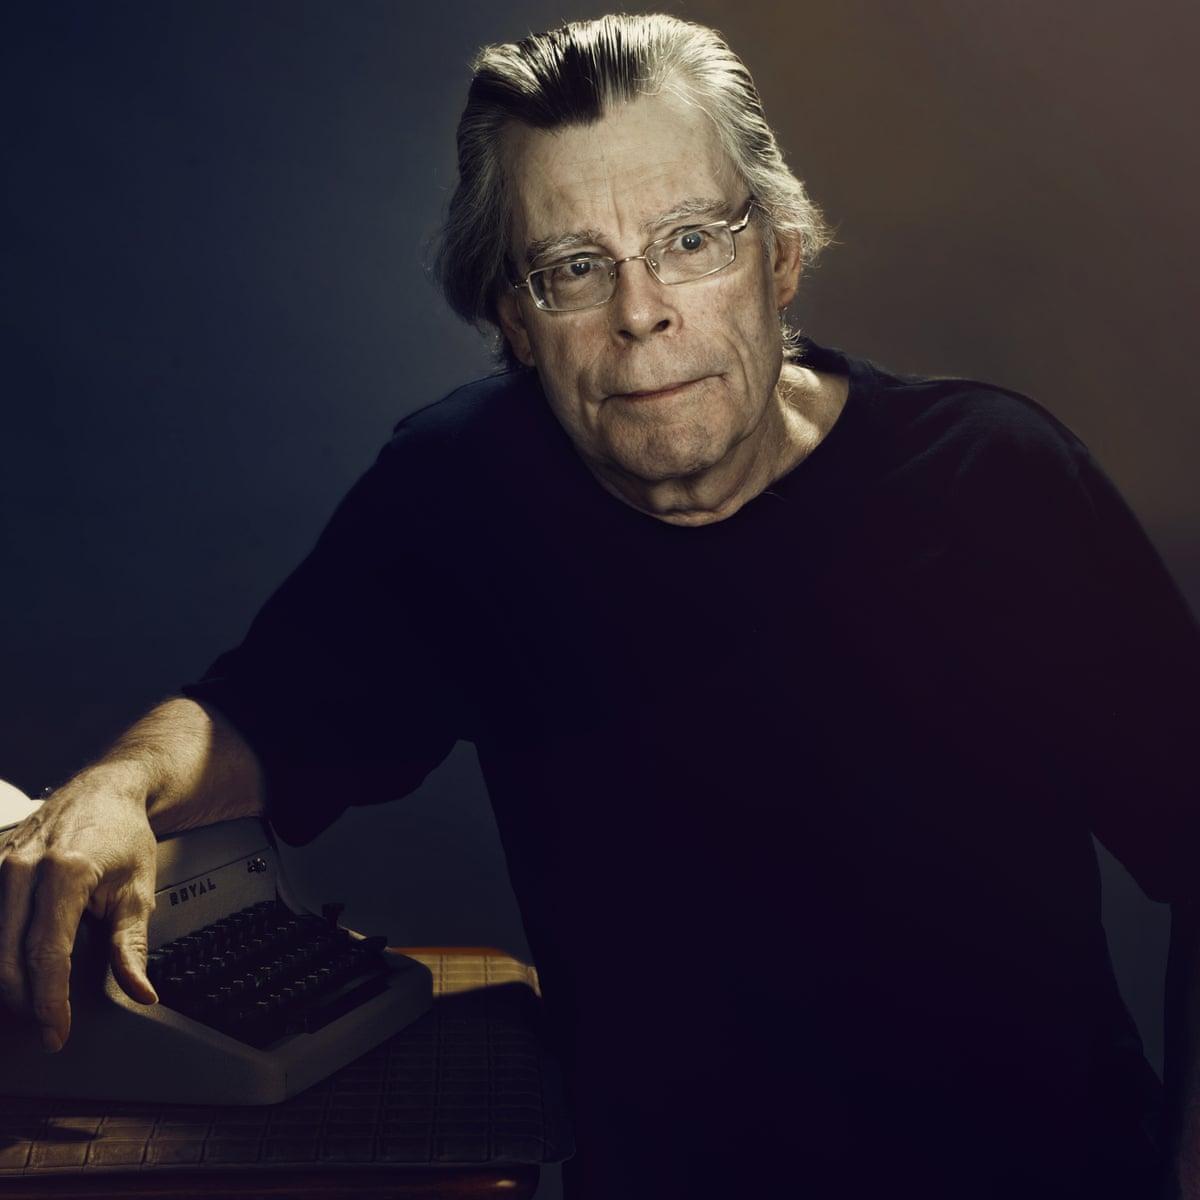 Stephen King: Birthday